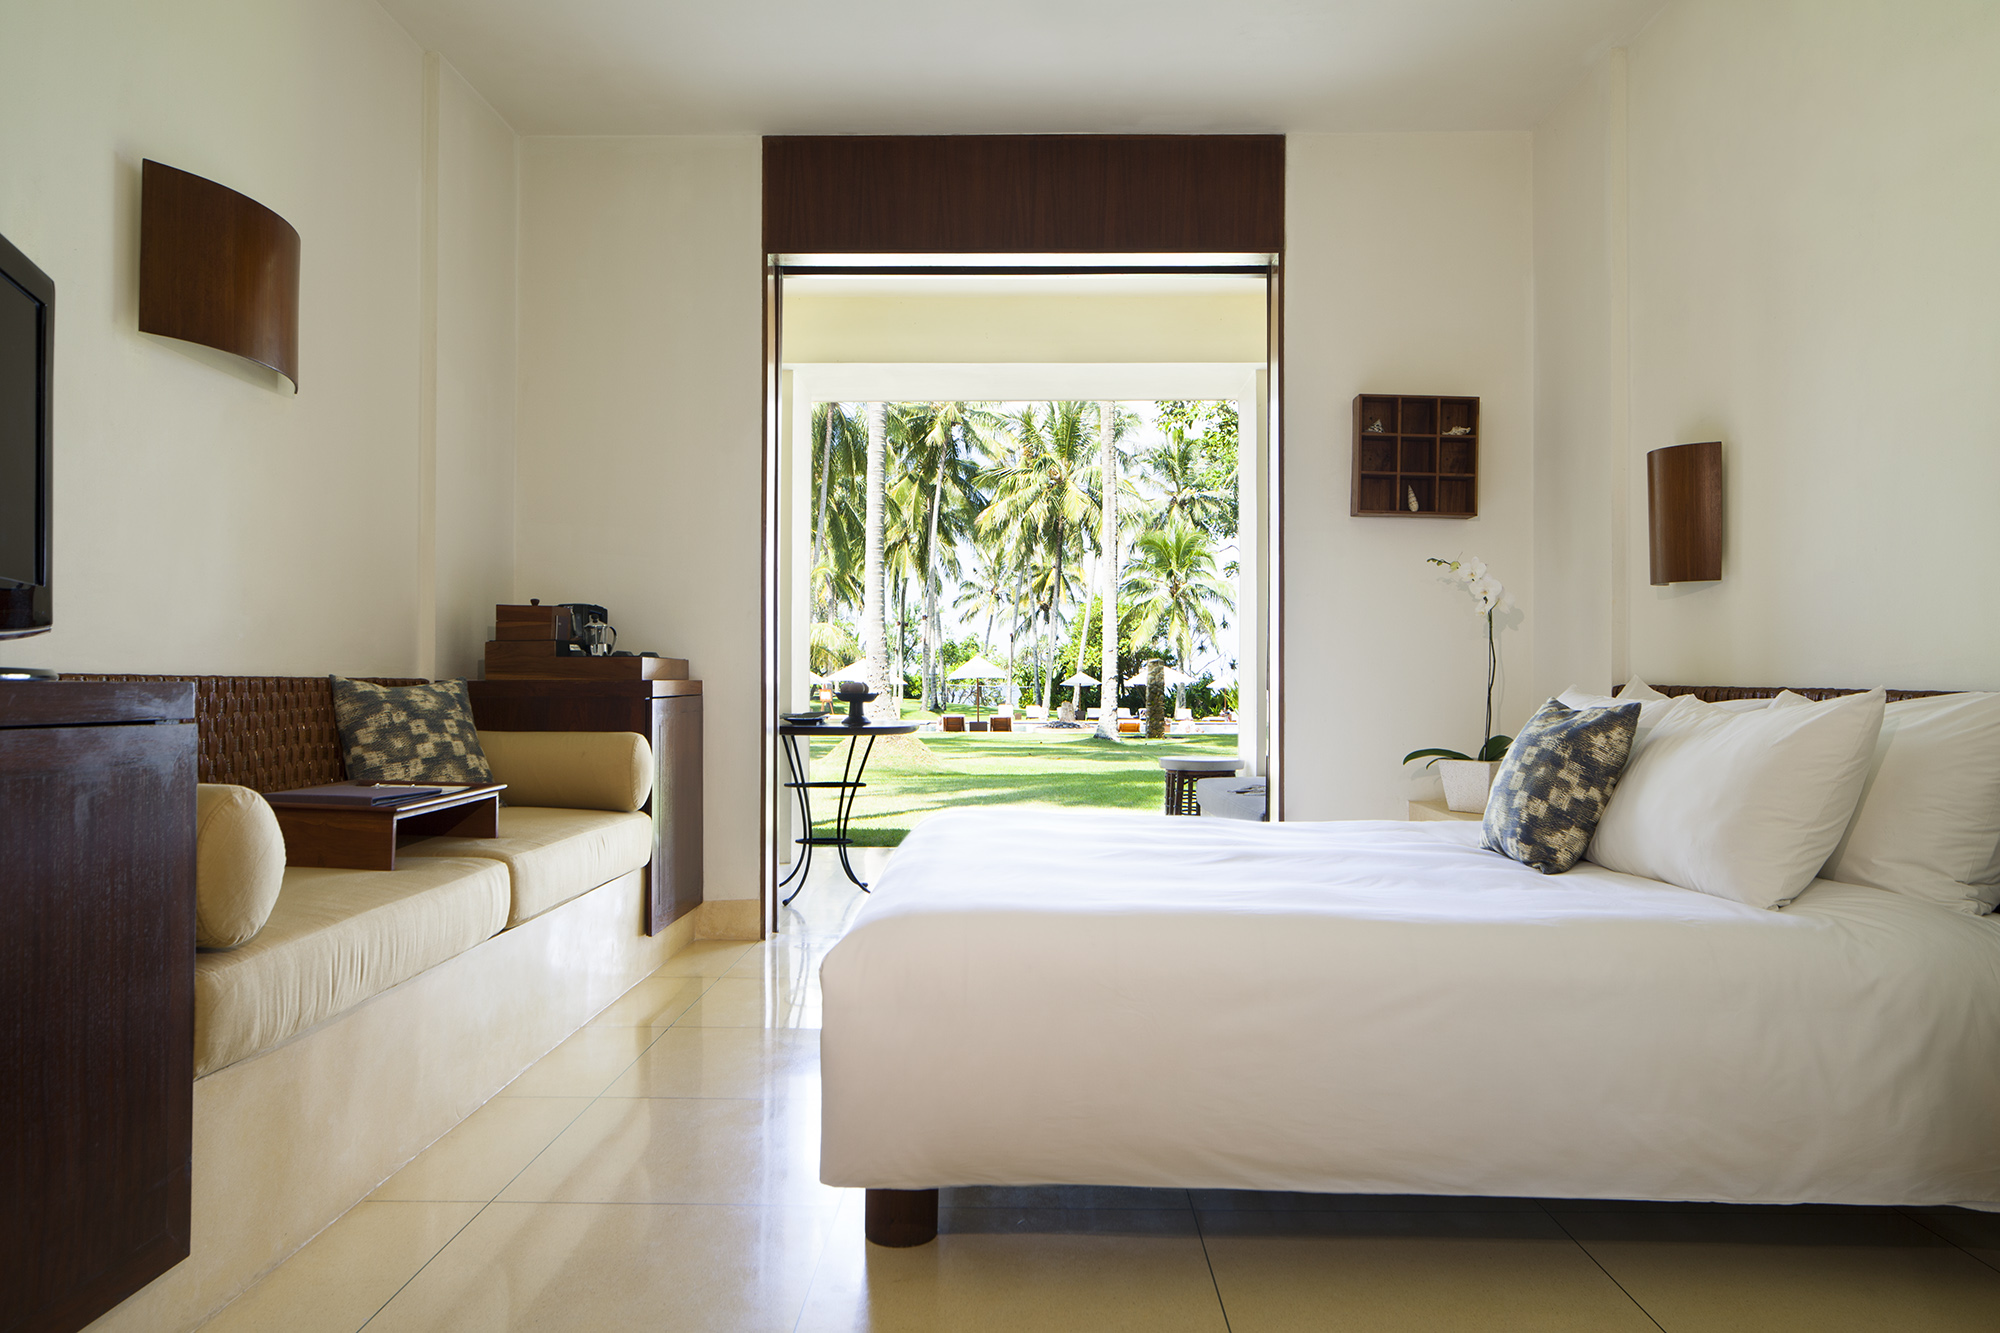 Alila Manggis - Accommodation - Superior Room 02.jpg